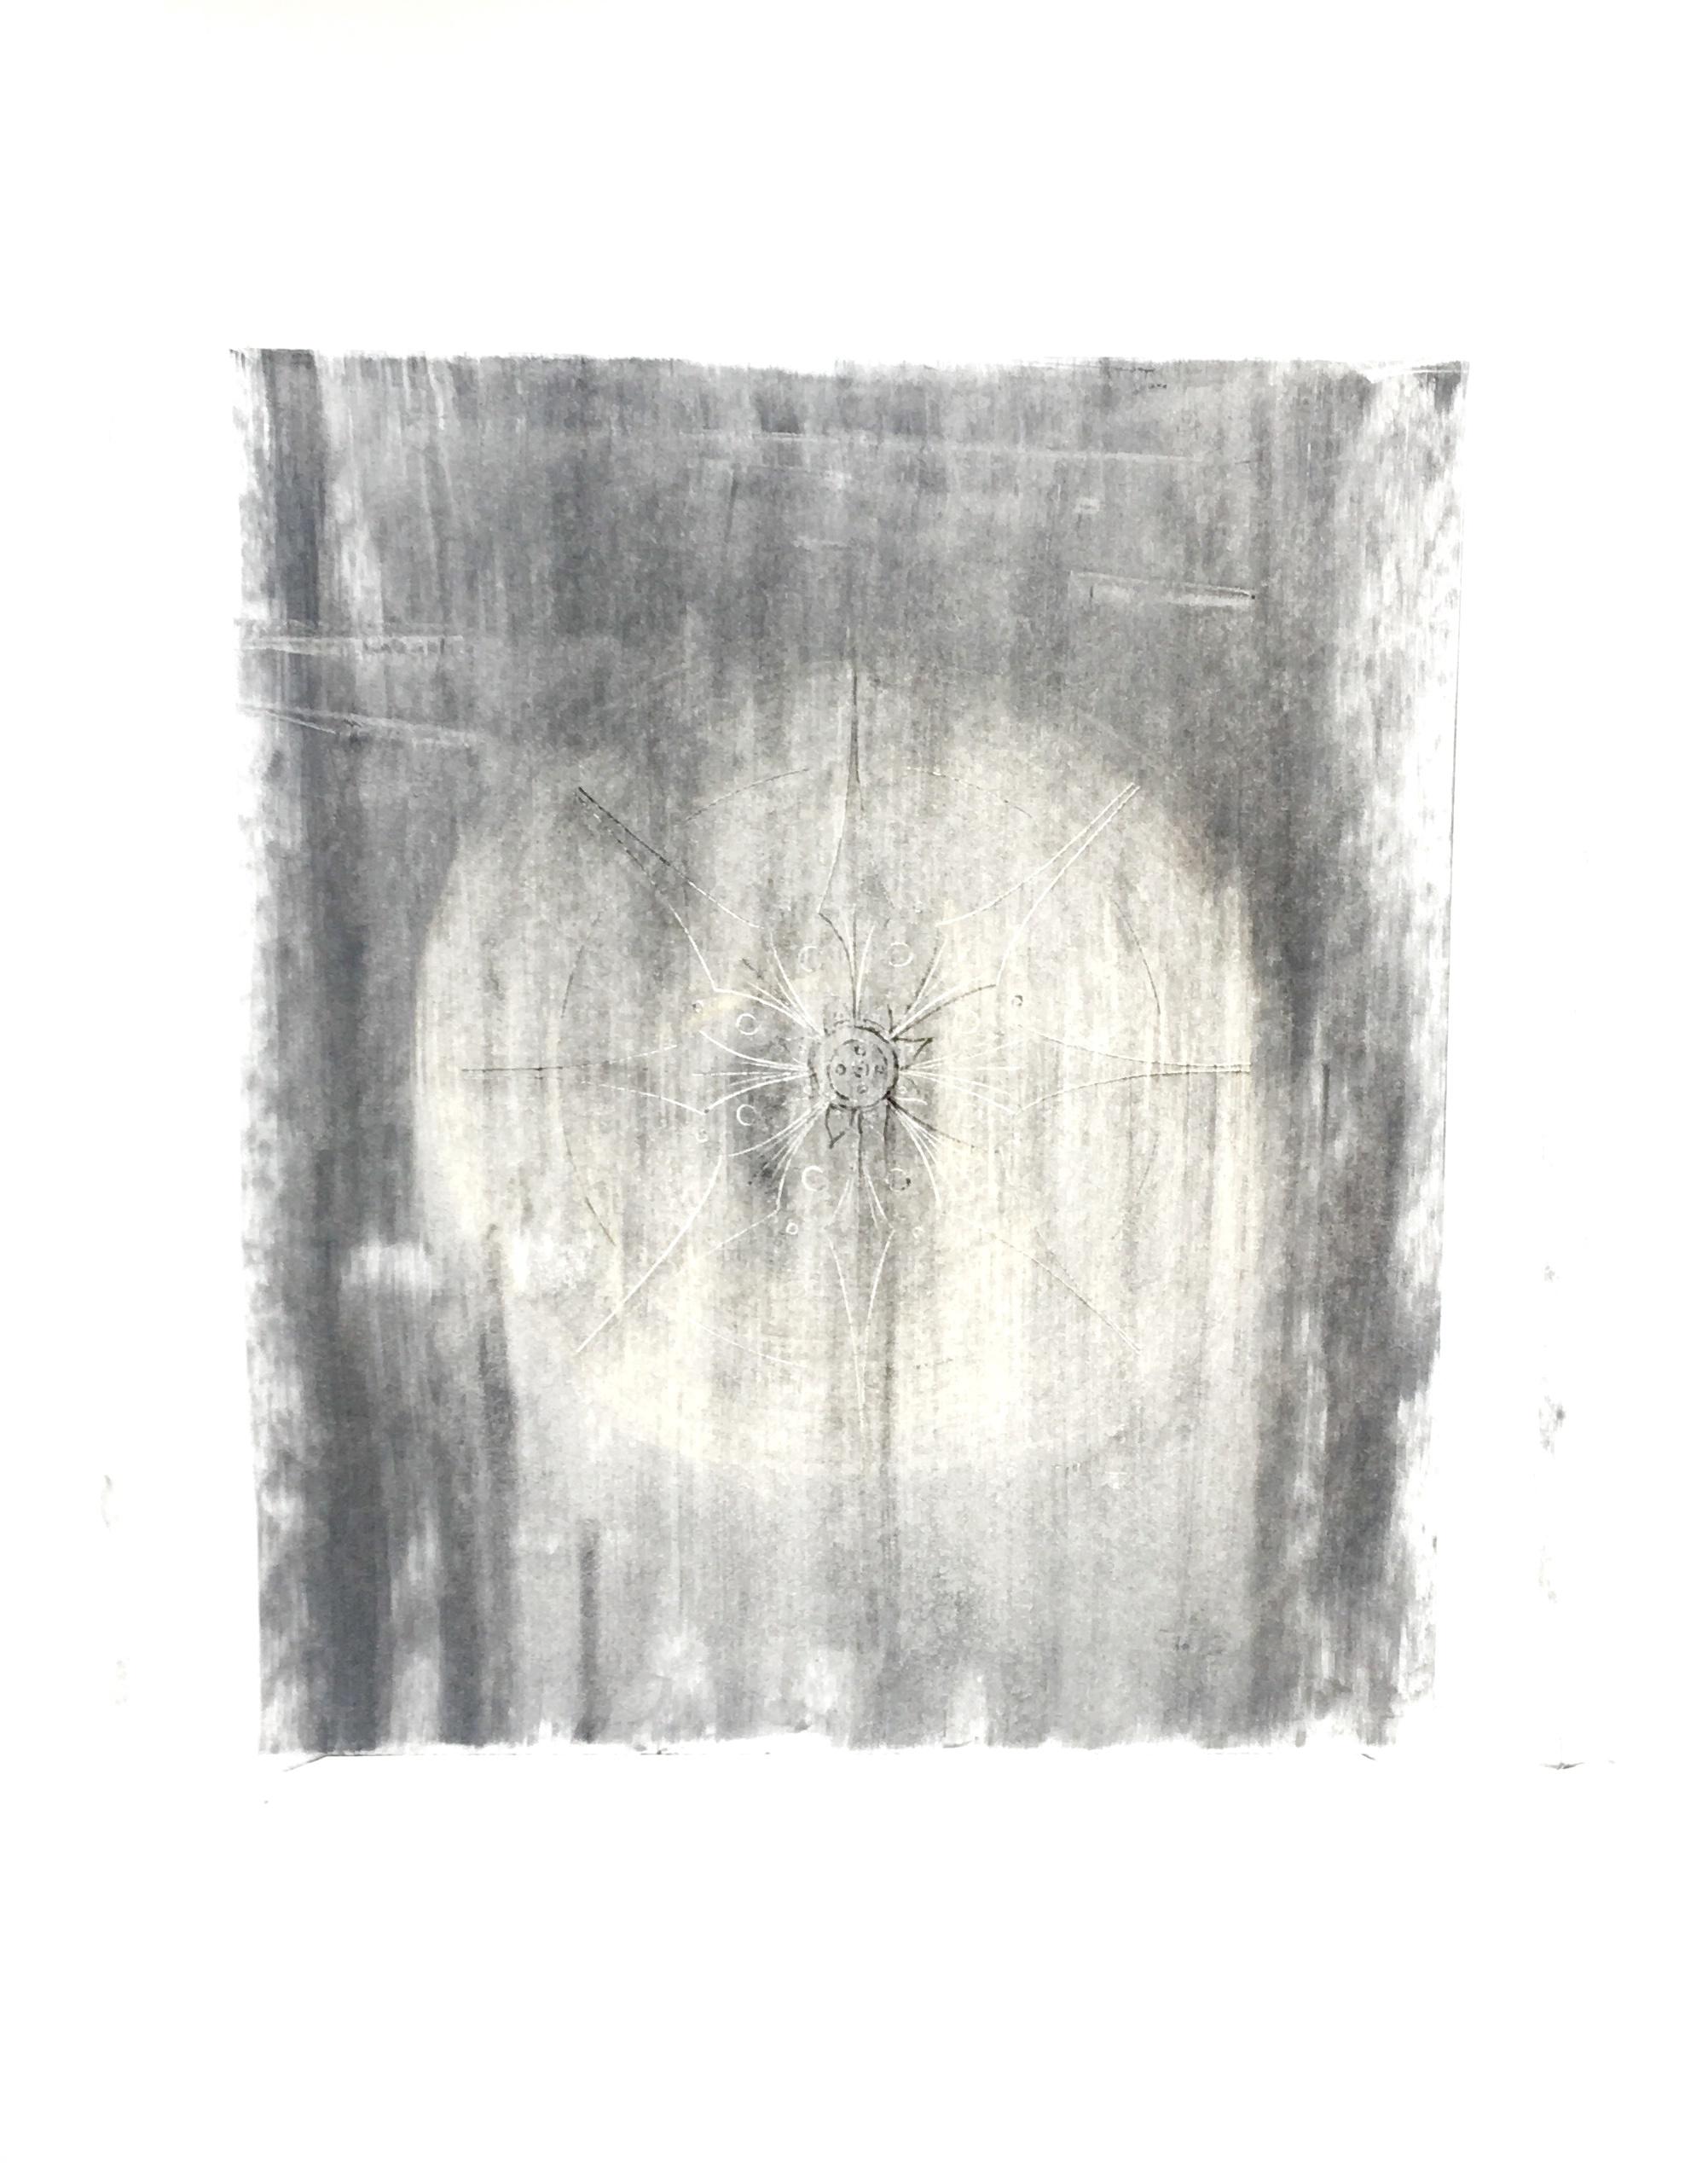 Impressed Mandala - 24 X 18 - Impressed Line, Ink, Pencil and Charcoal on Bristol